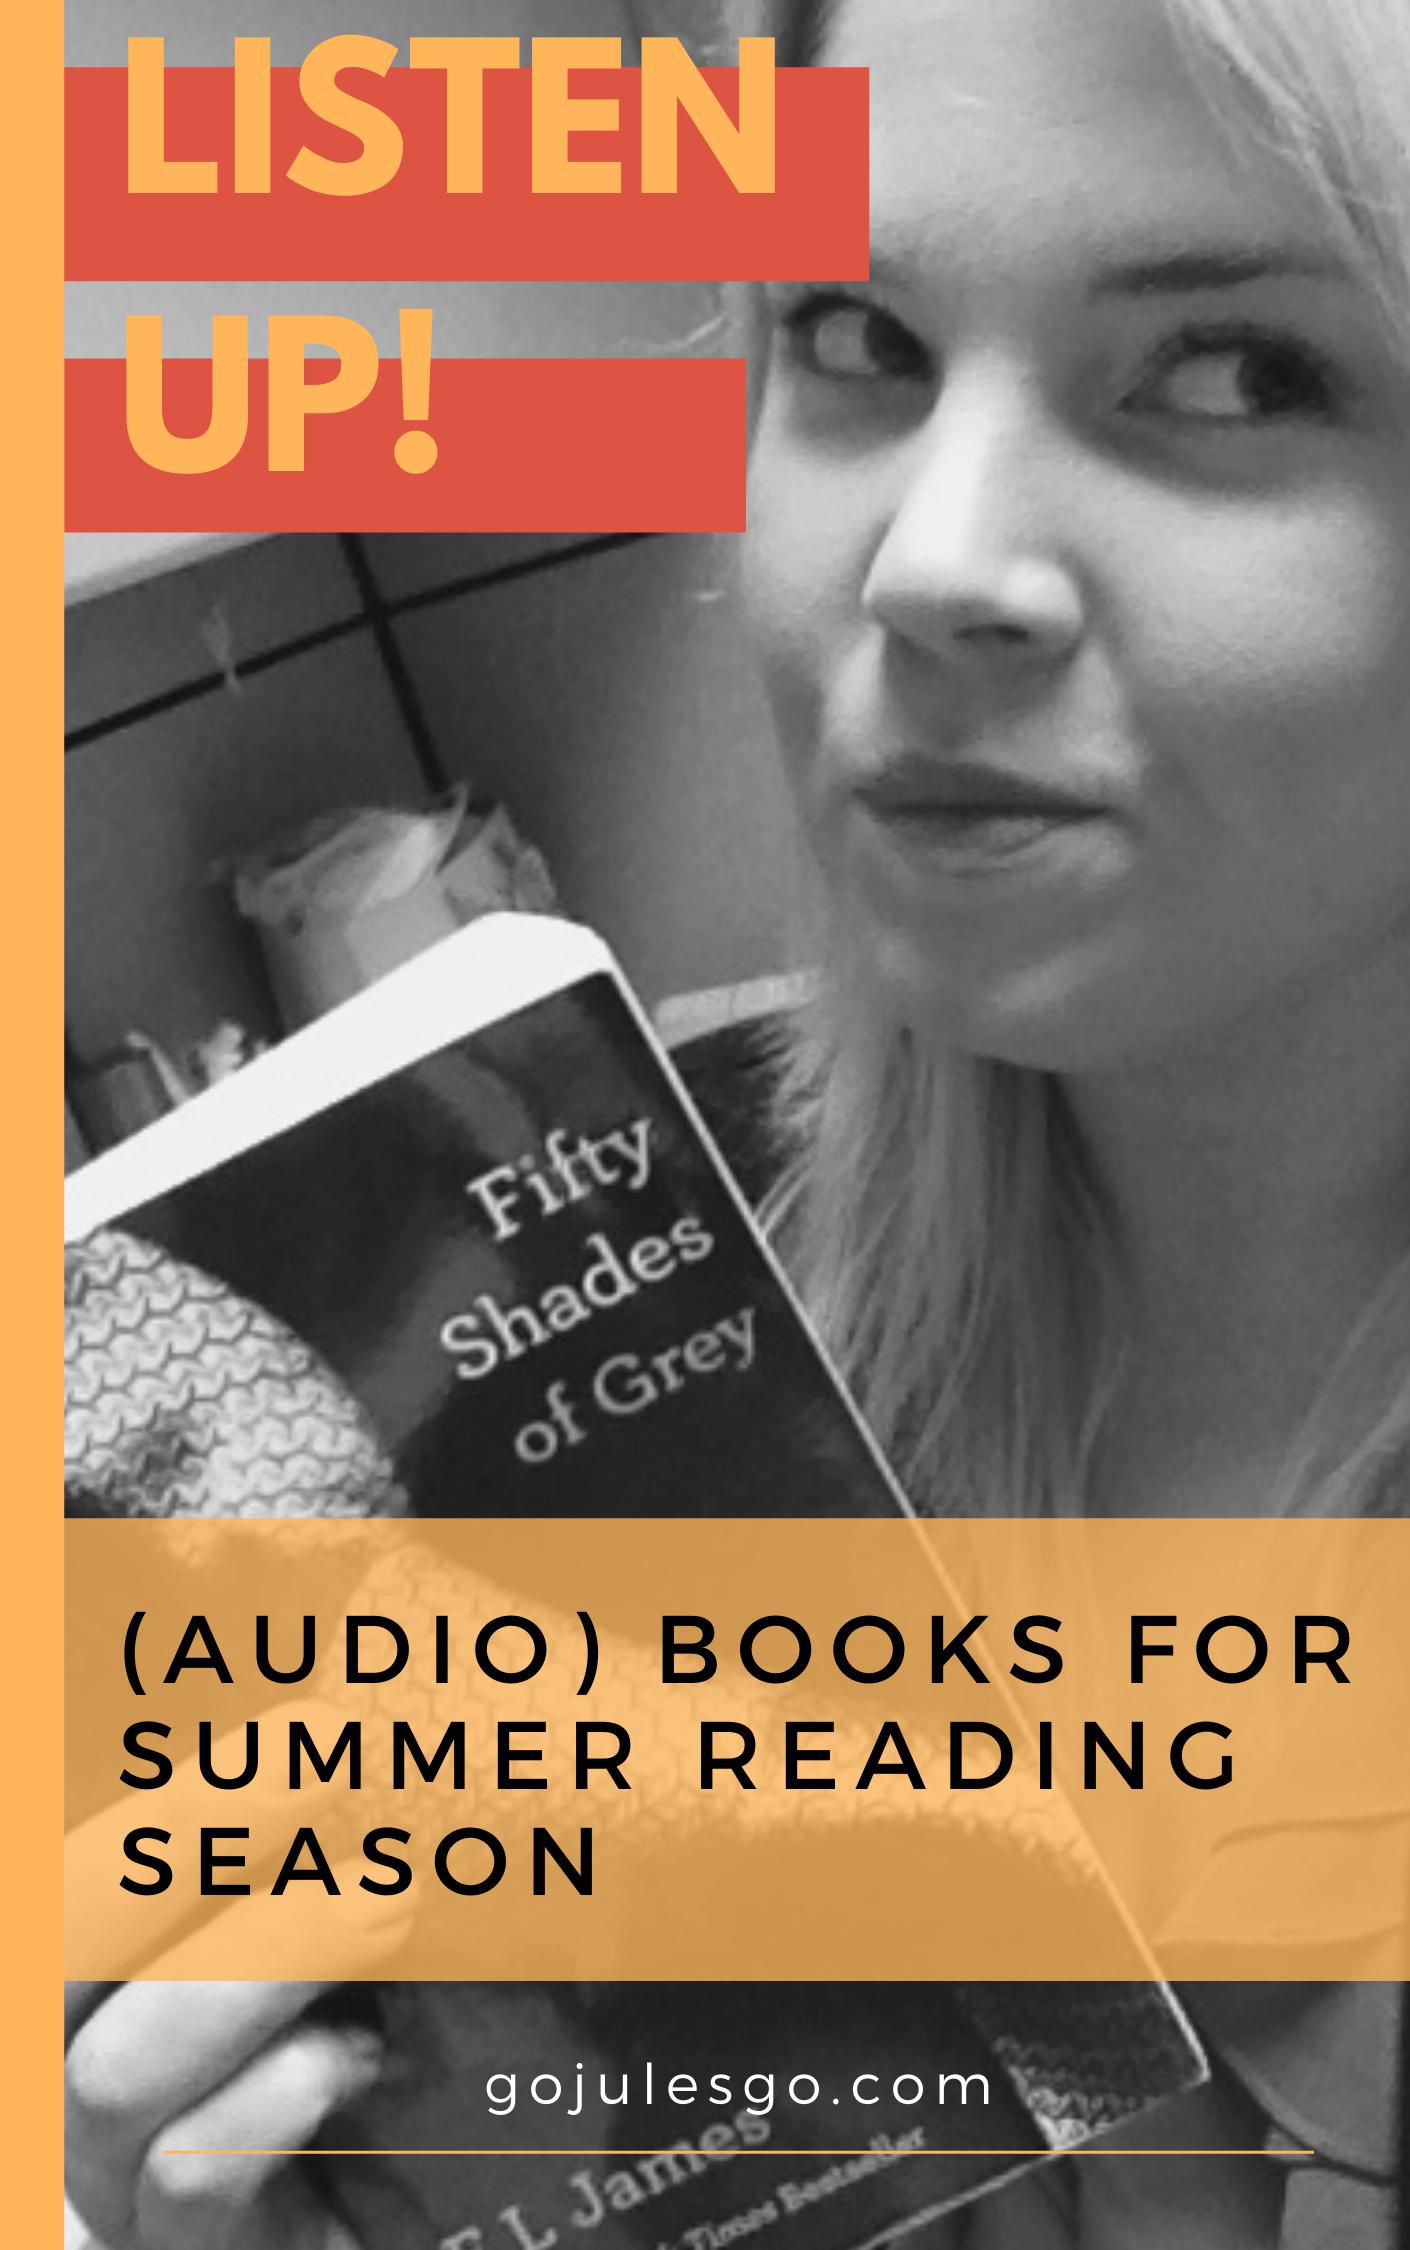 Go Jules Go Title Graphic LISTEN UP Audio Books for Summer Reading Season_3JUN2020